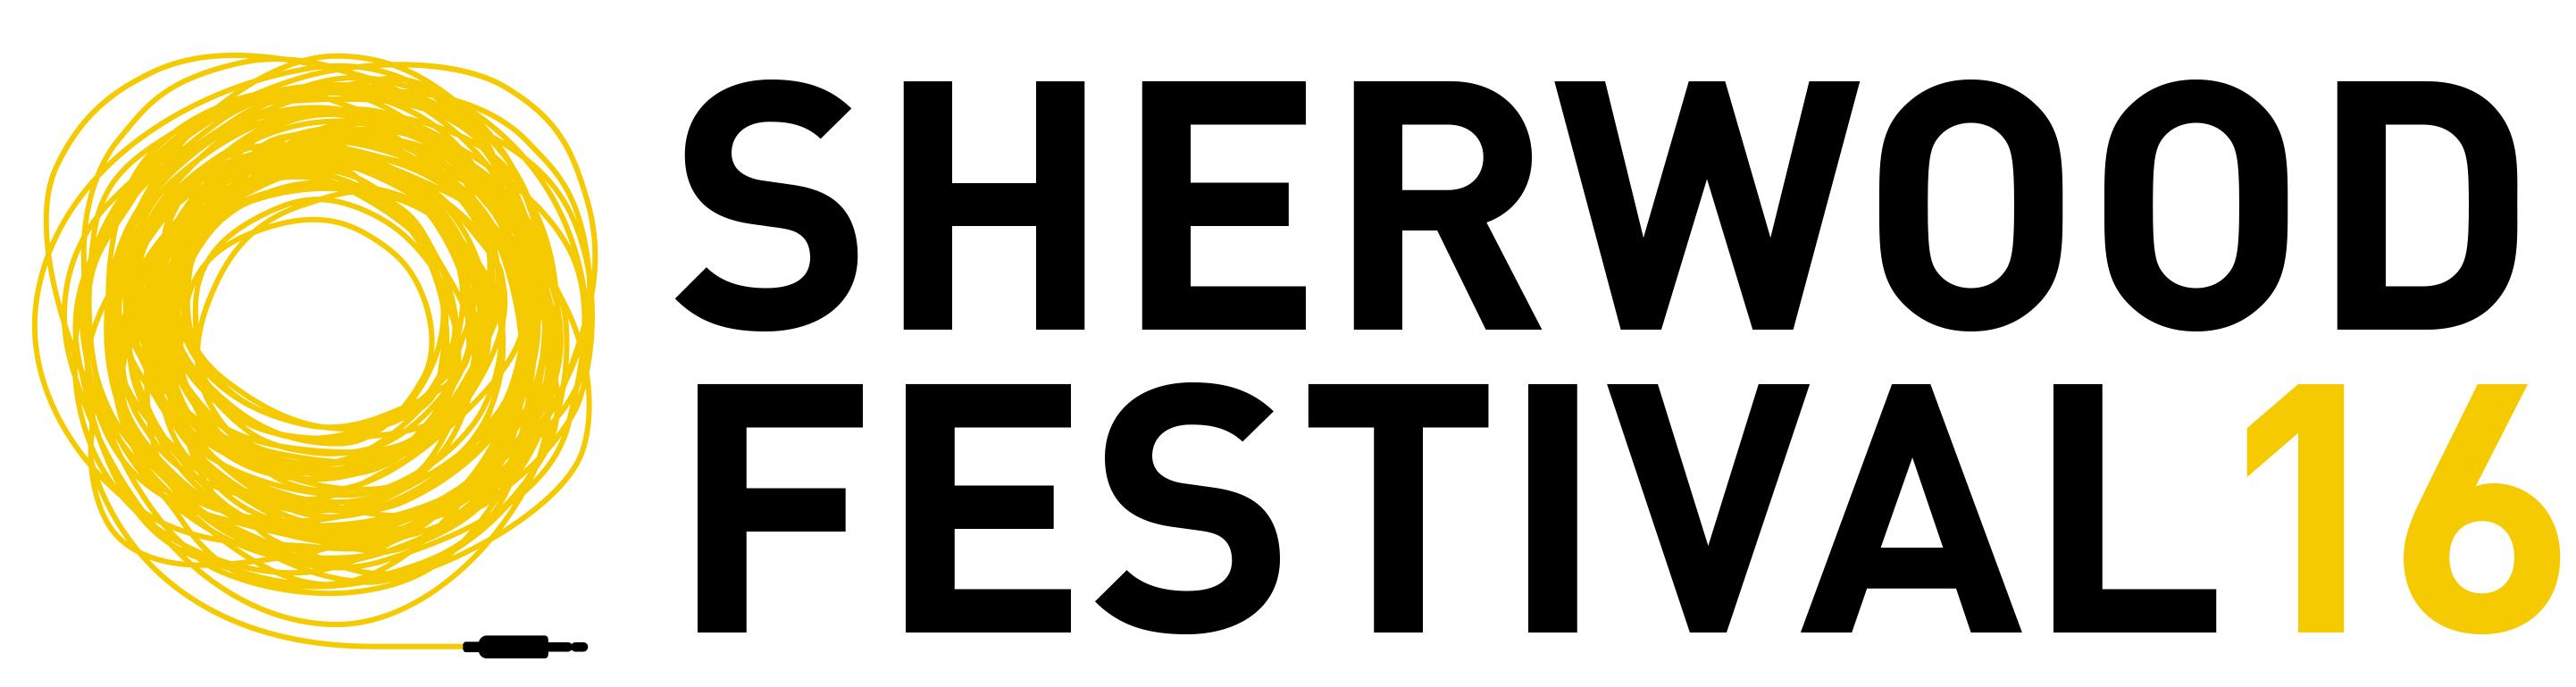 LOGO Sherwood Festival 2016